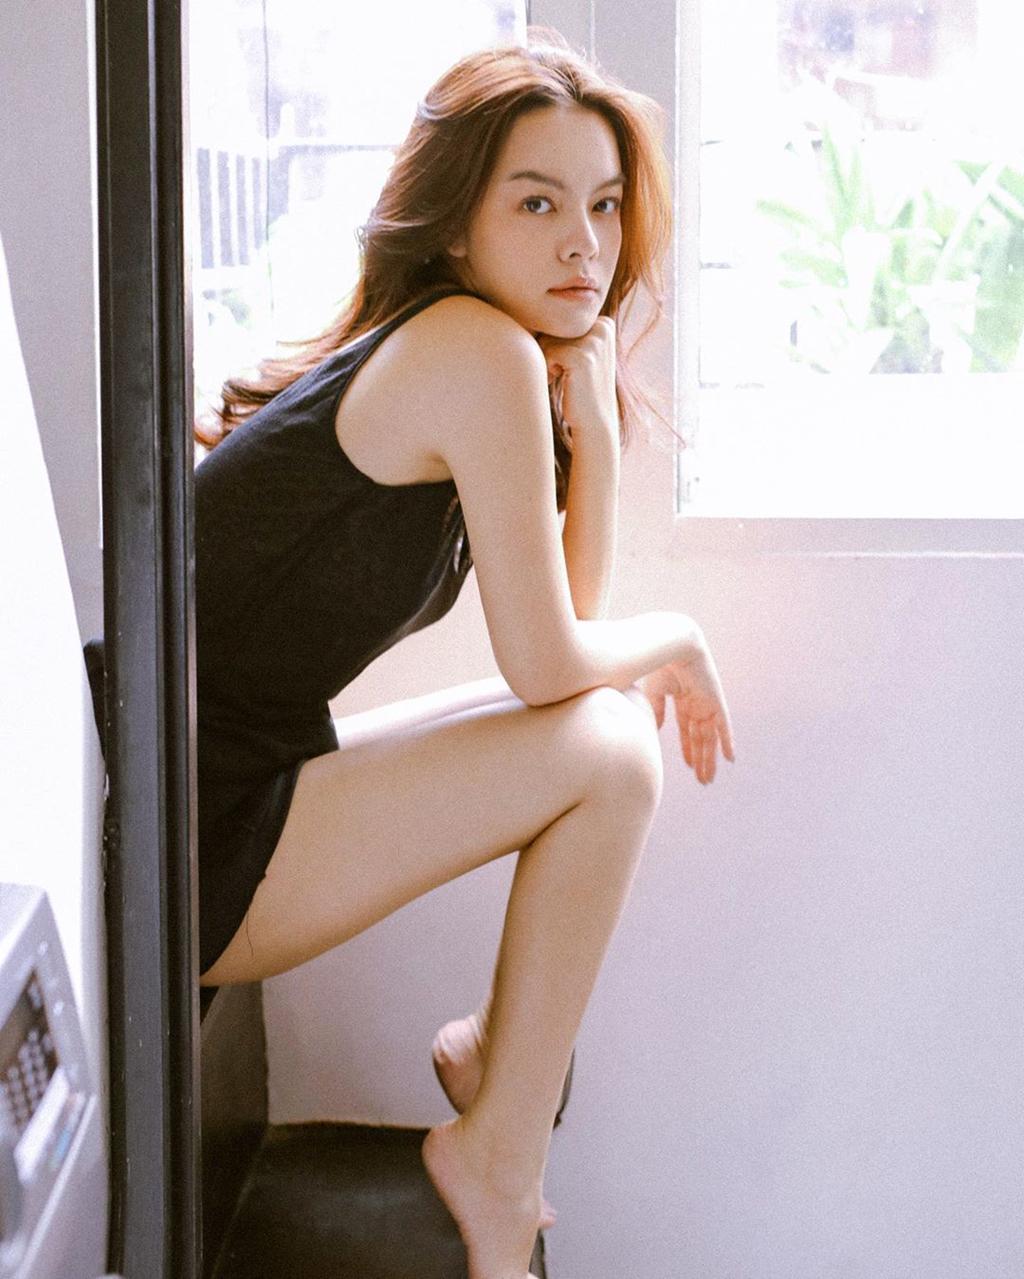 Pham Quynh Anh lan hiem hoi dang anh mac bikini hinh anh 5